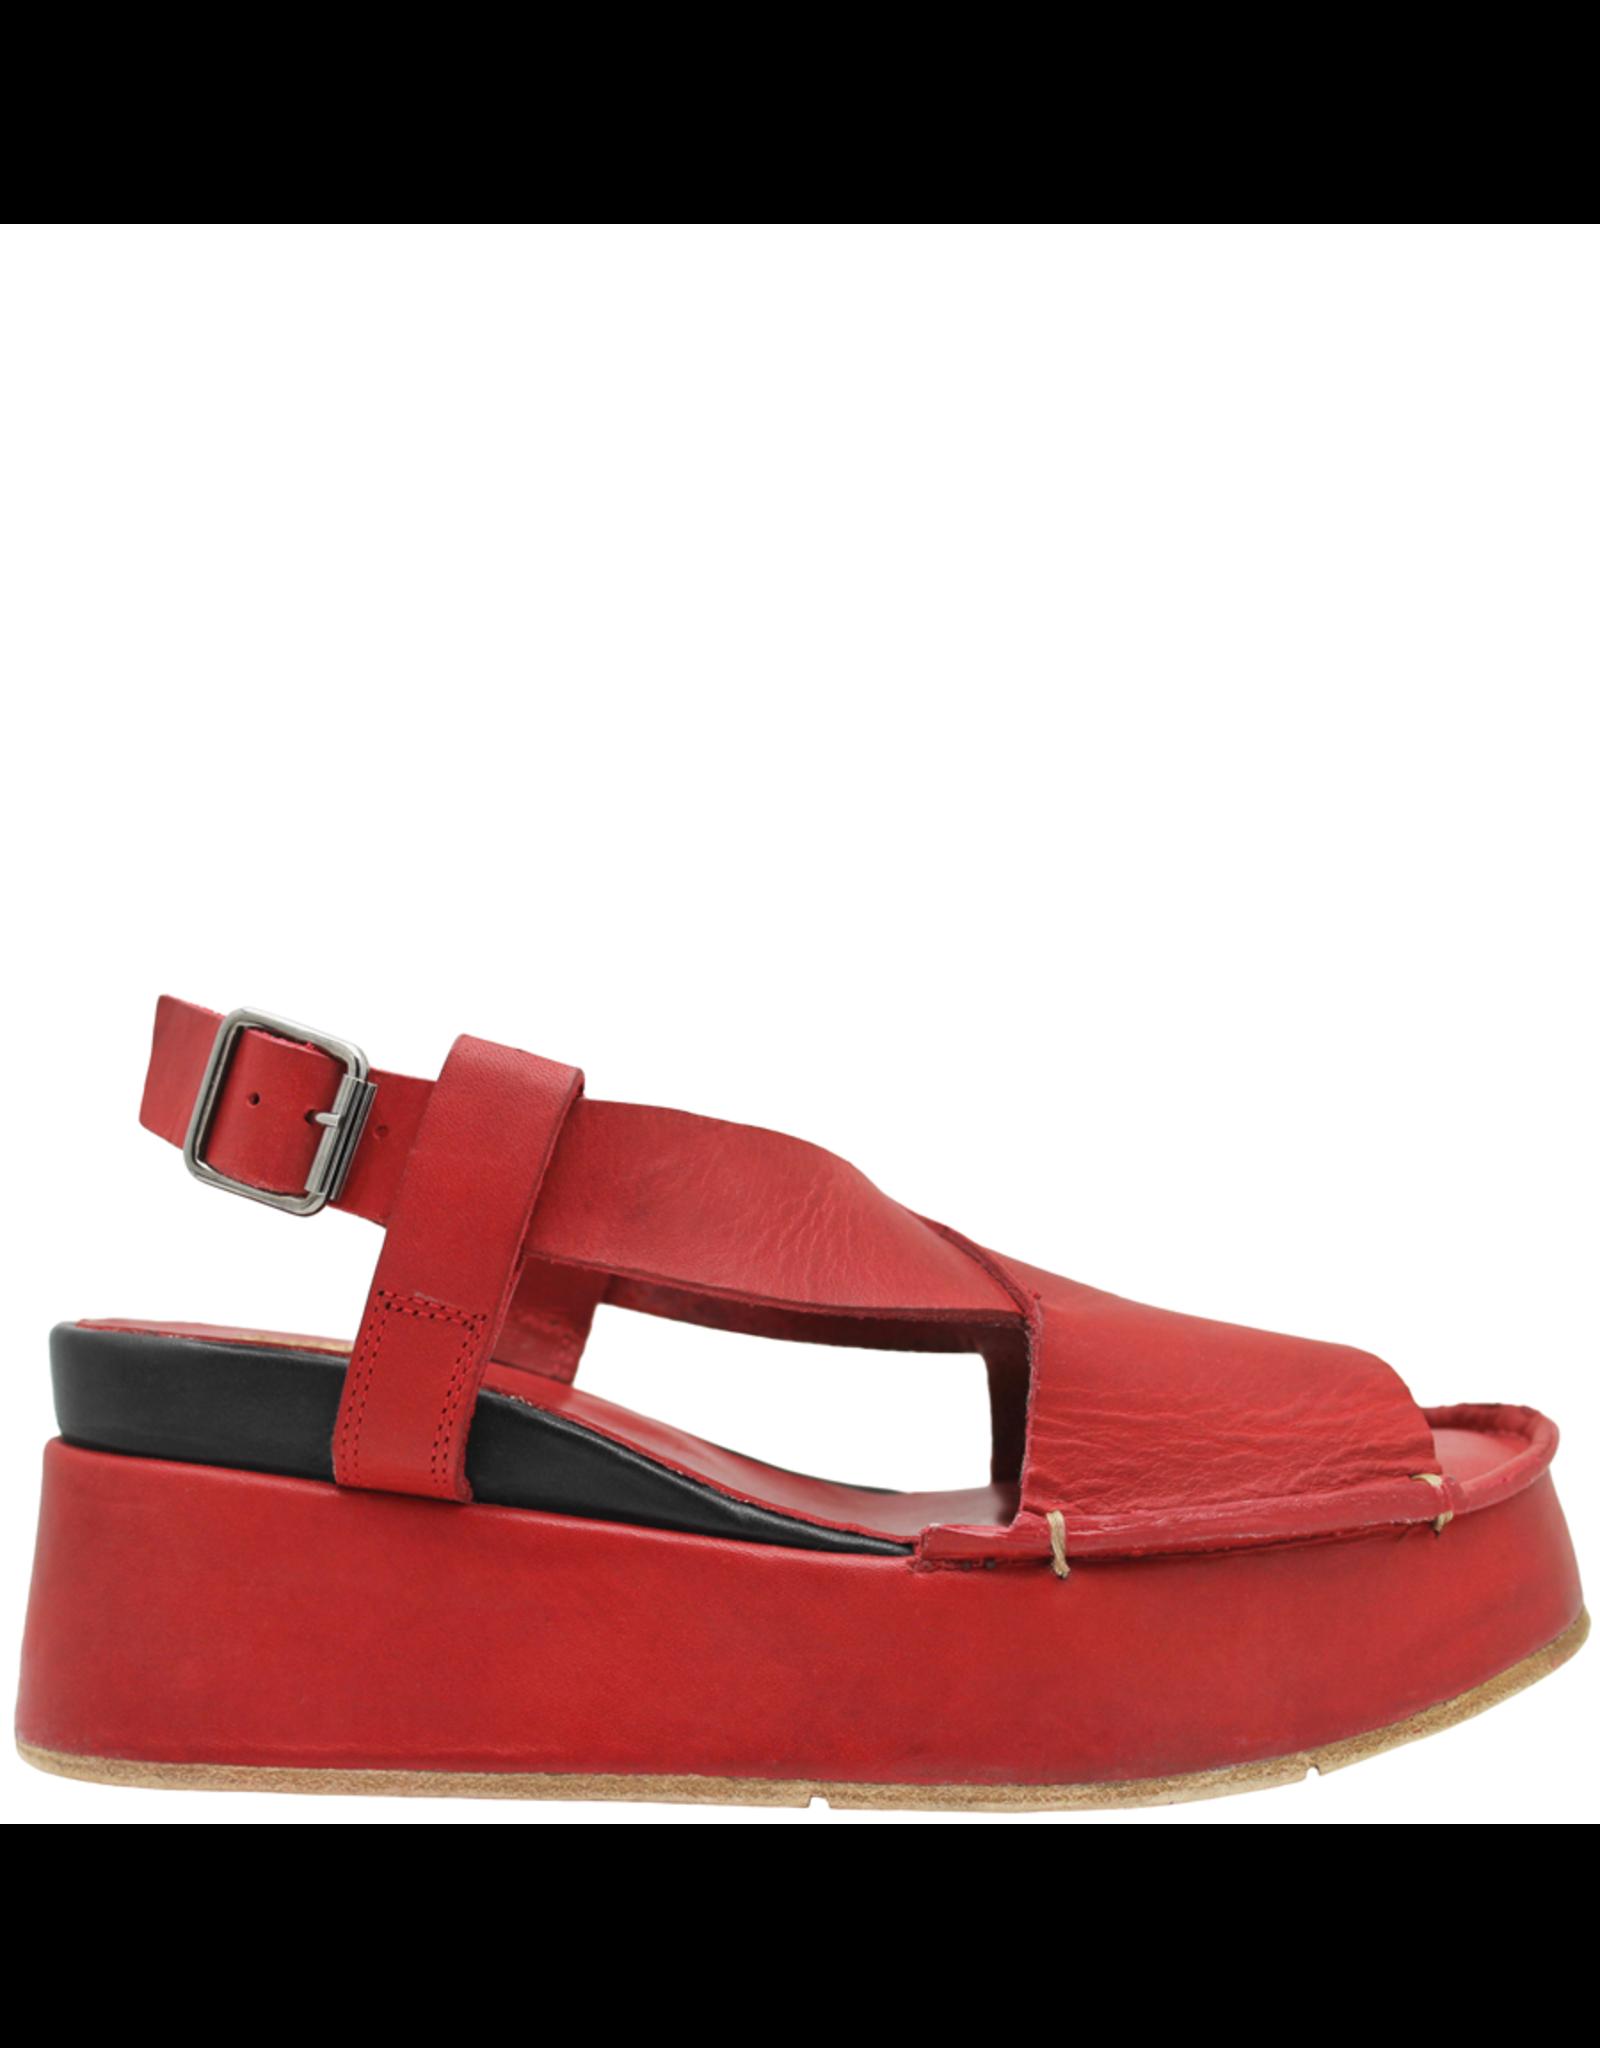 Moma Moma- Red Fiesta Wedge Sandal 2145